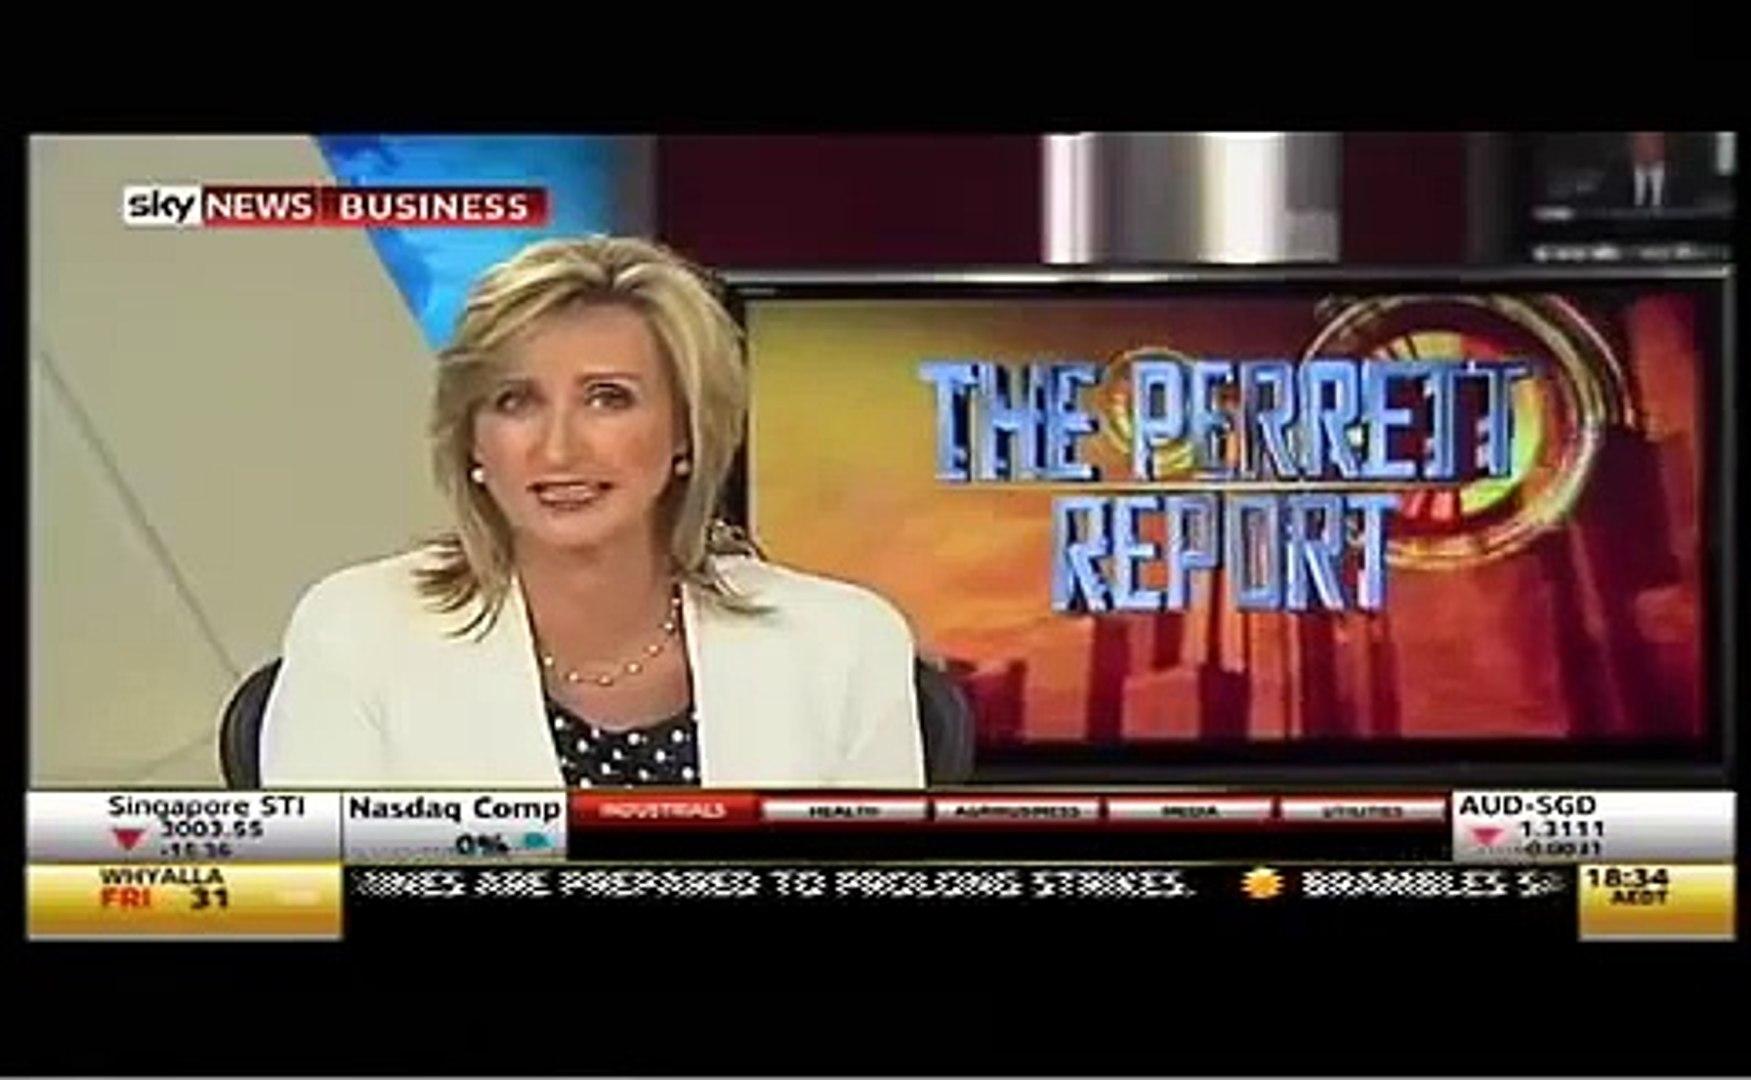 James Fallows on Australian and American politics - Sky News 28/03/12